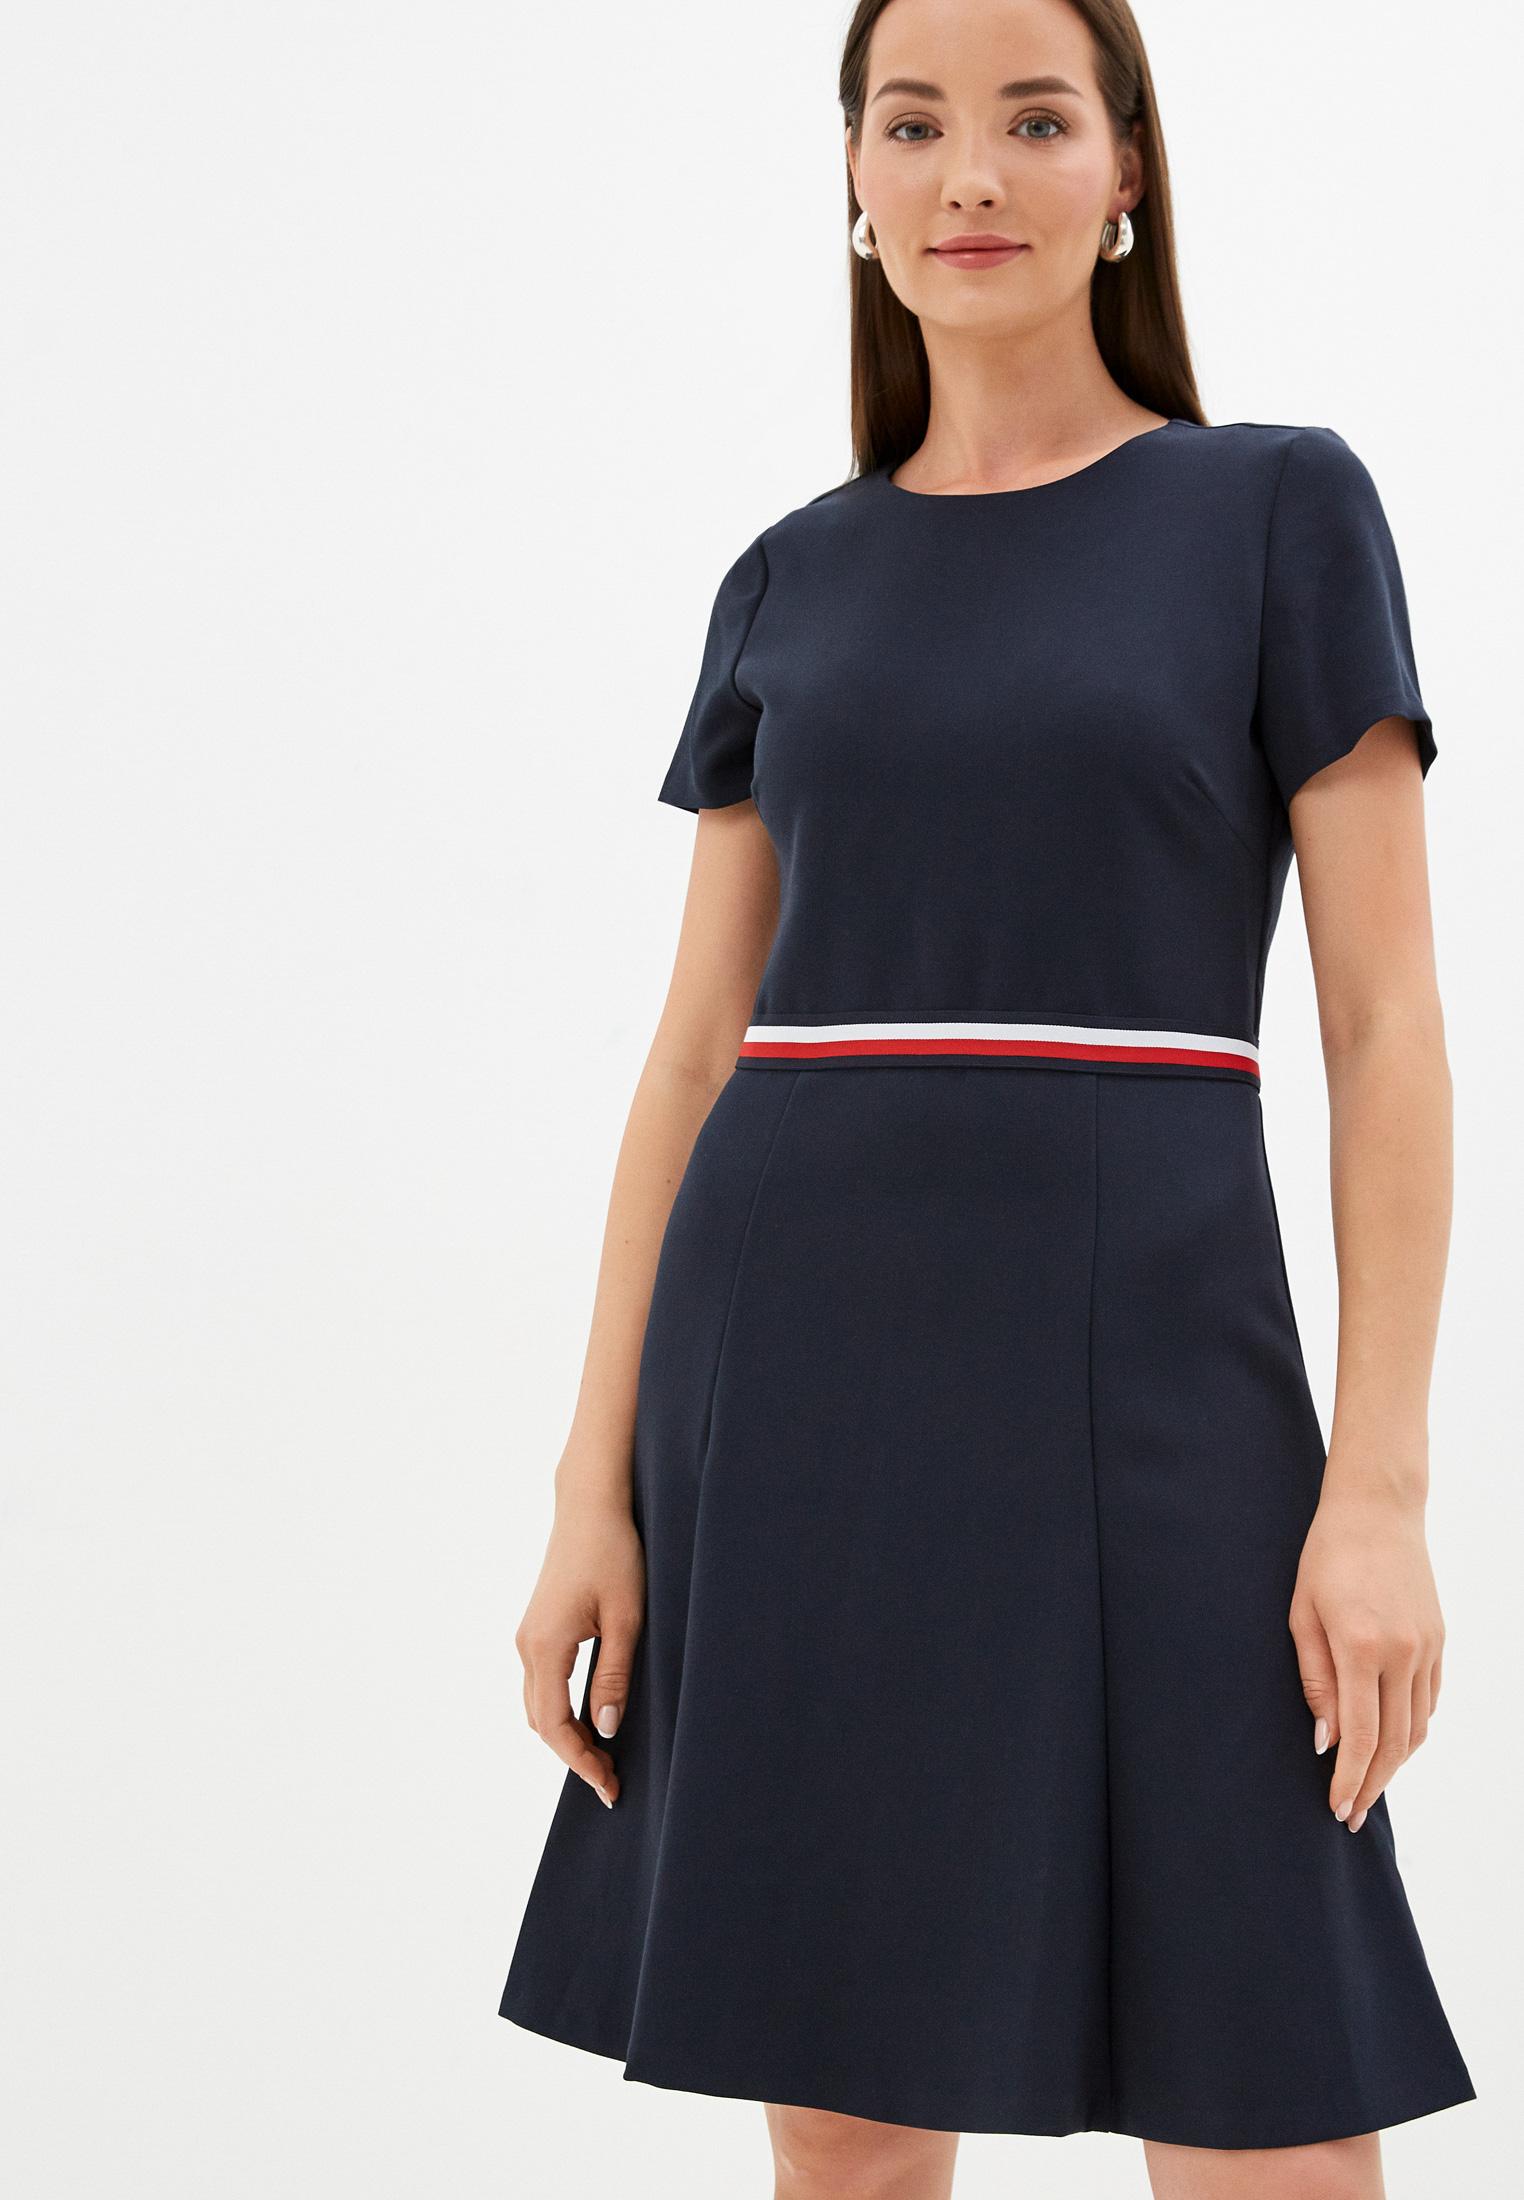 Платье Tommy Hilfiger (Томми Хилфигер) WW0WW30997